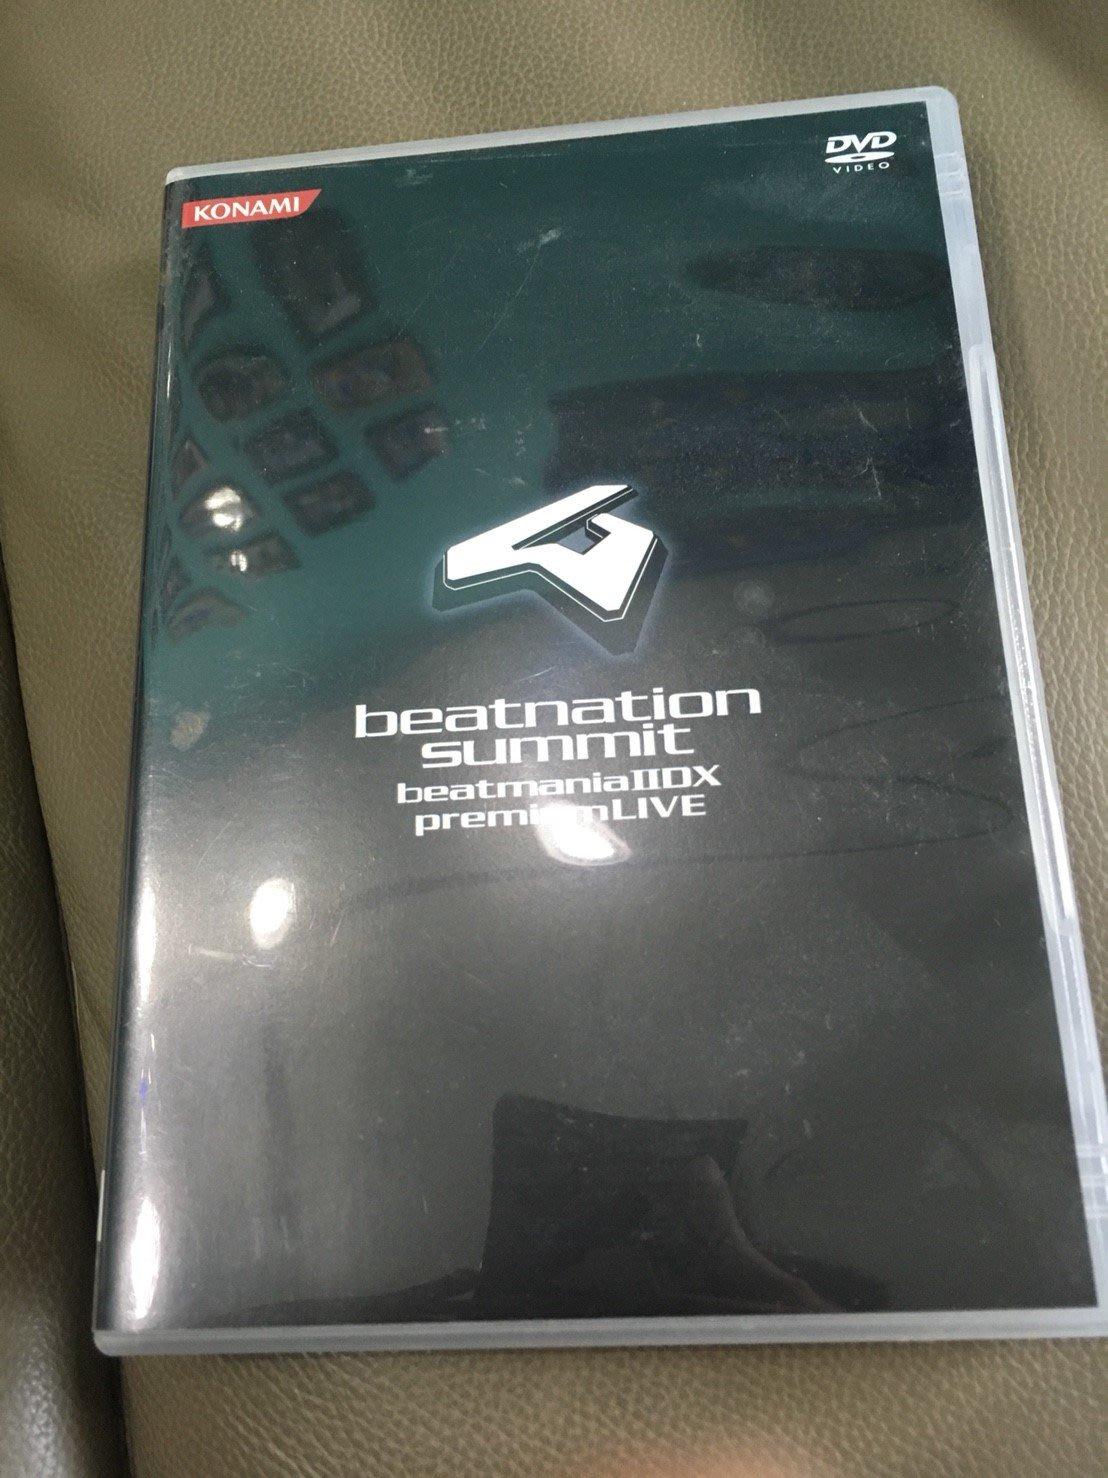 全新 beatnation summit beatmania IIDX premium LIVE KONIMA DVD 狂熱節拍IIDX 演唱會